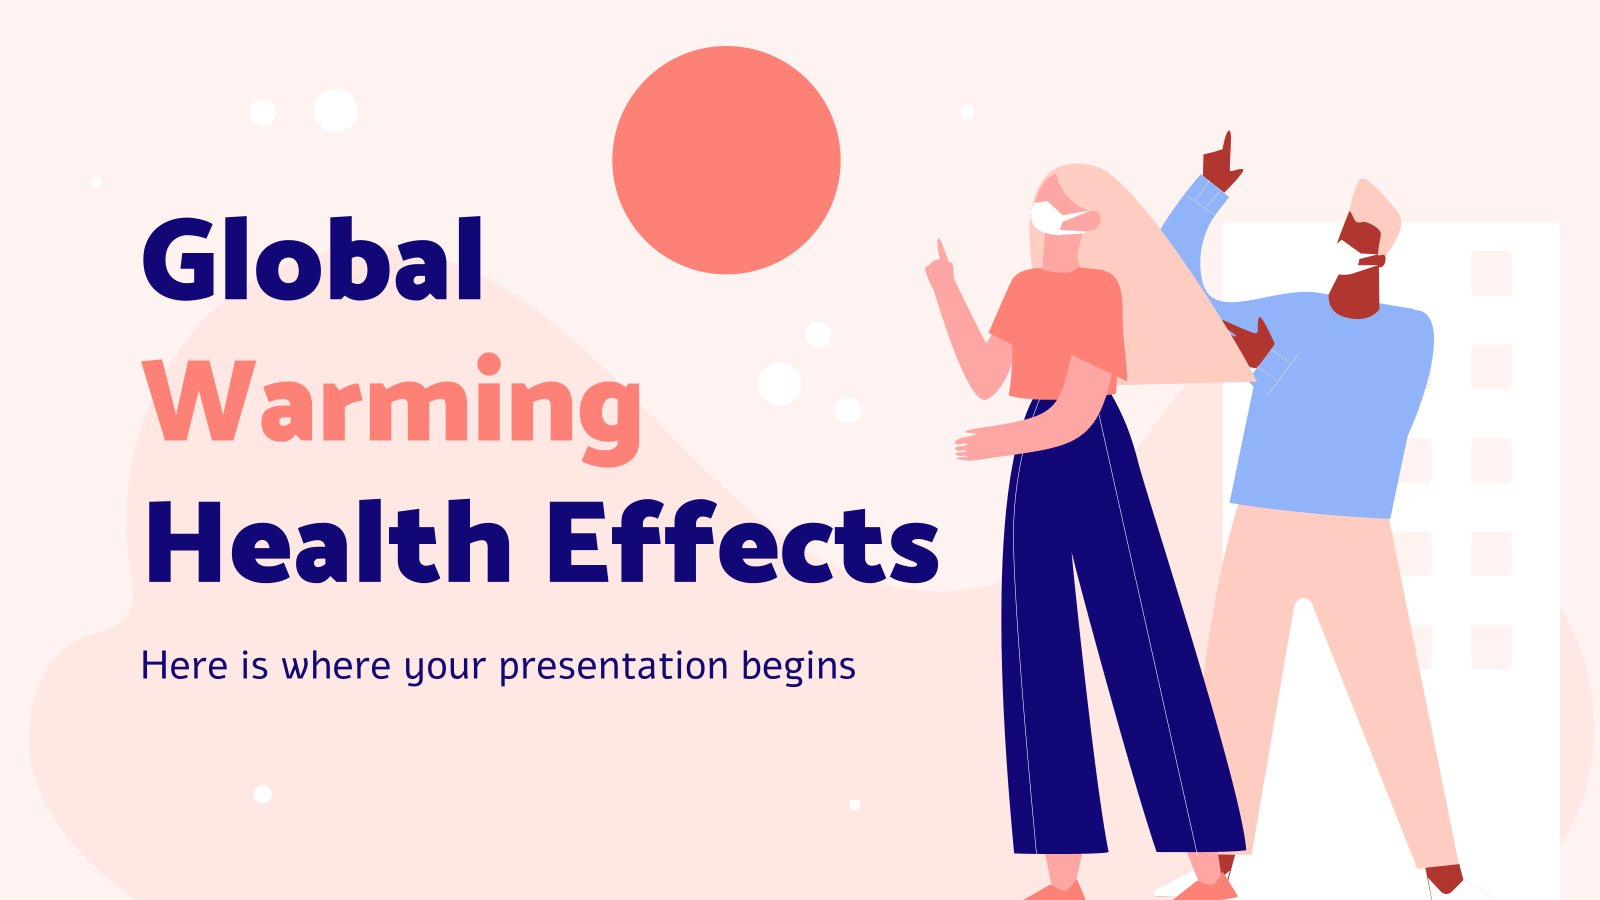 Global Warming Health Effects presentation template